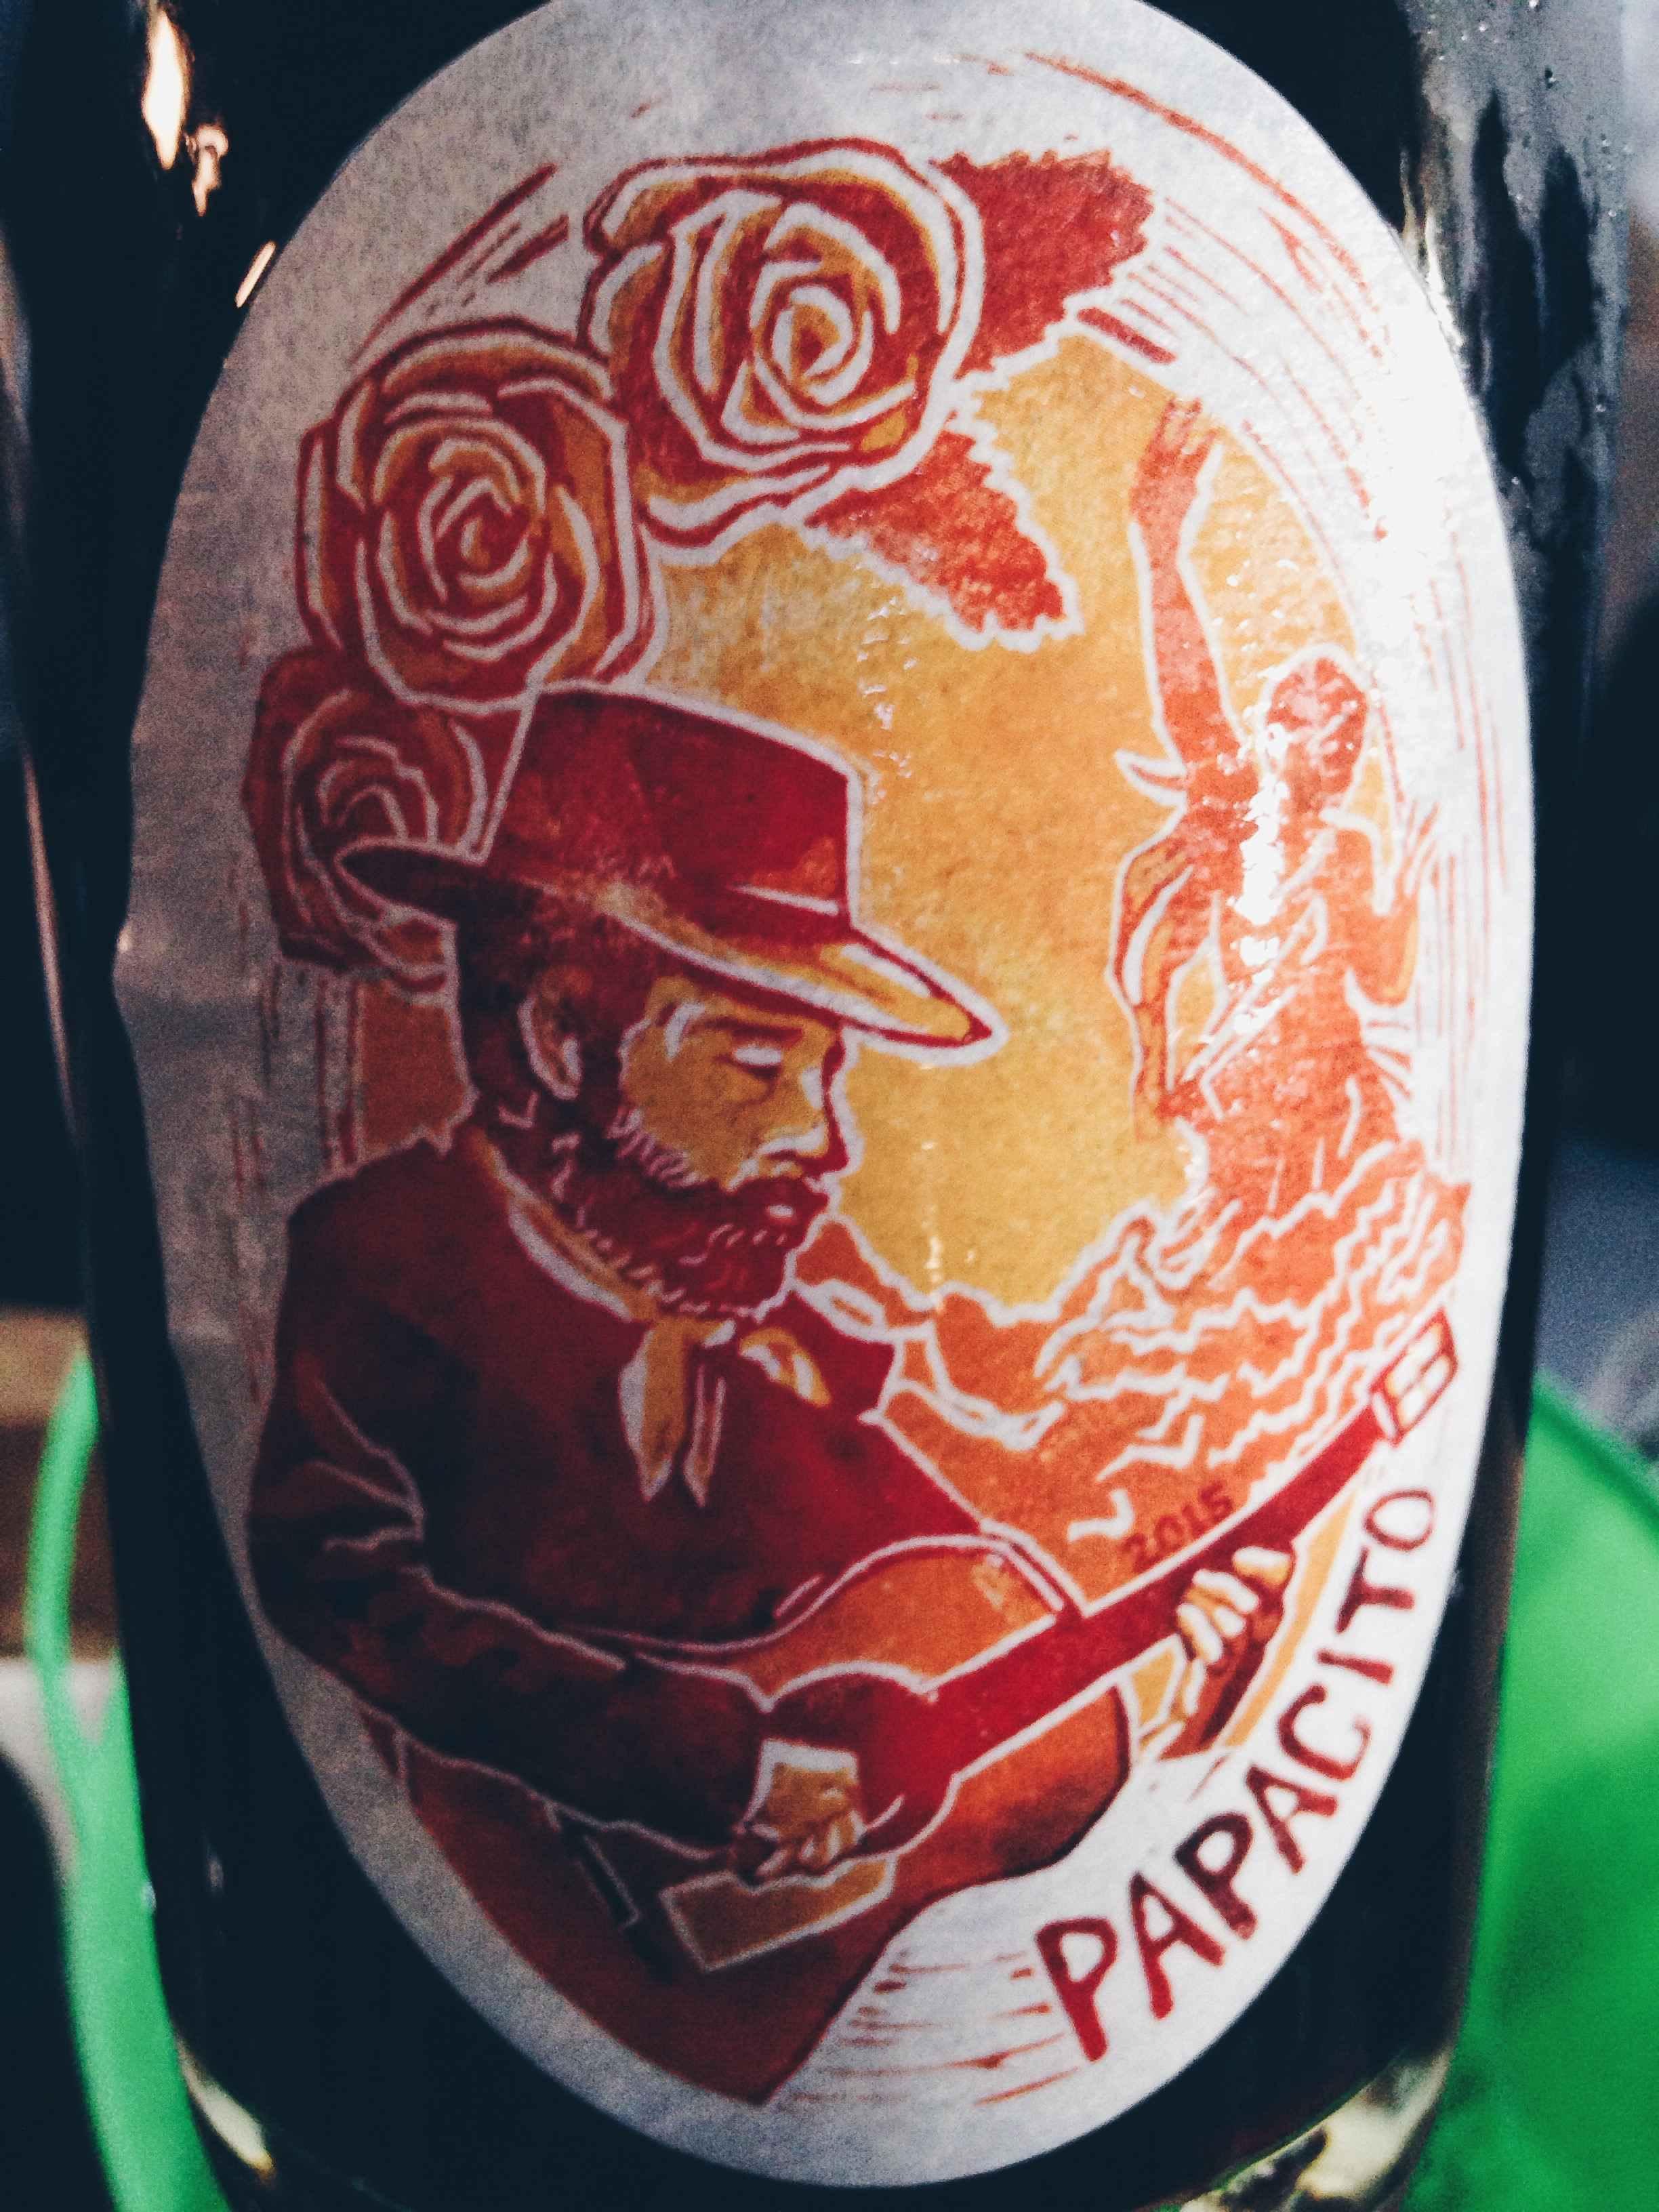 Papasito 2015 Day Wines, Willamette Valley